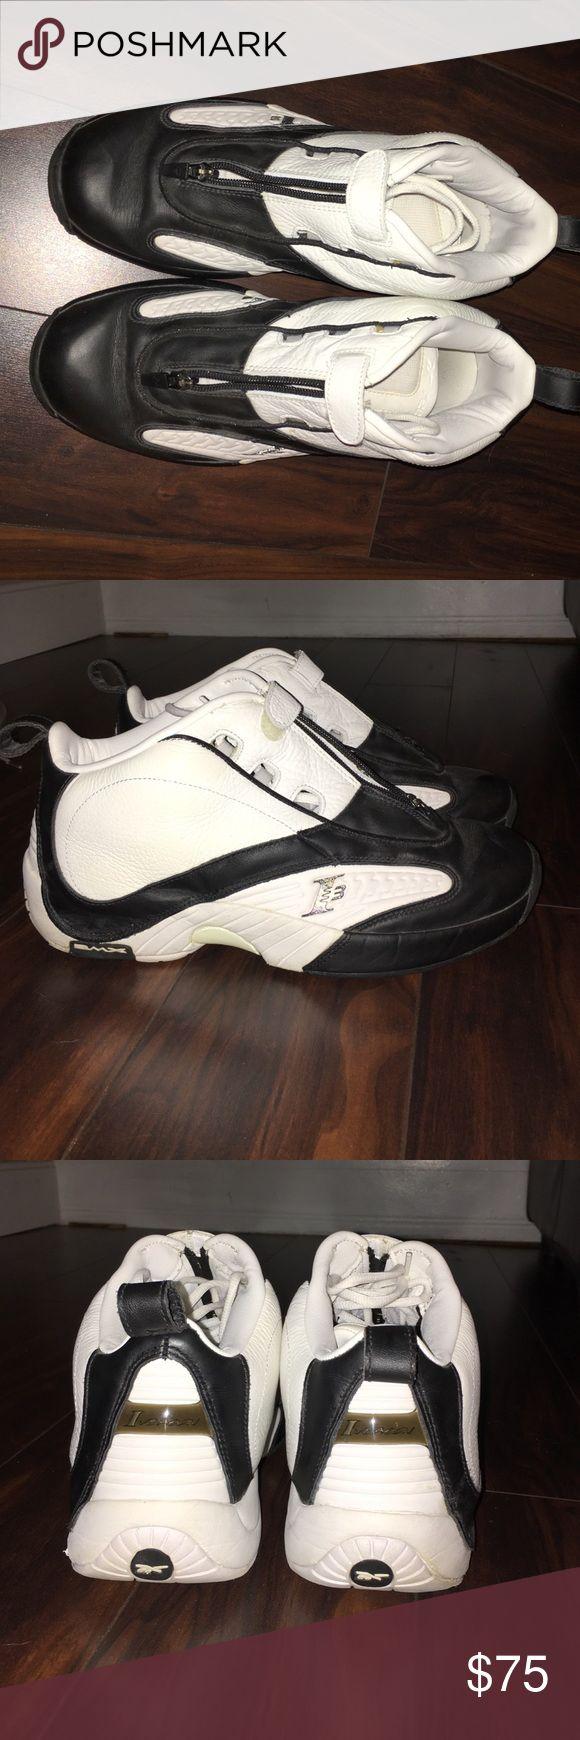 Size 10 Men's Reebok Allen Iverson Shoes Rarely worn,size 10 Allen Iverson Sneakers Reebok Shoes Sneakers